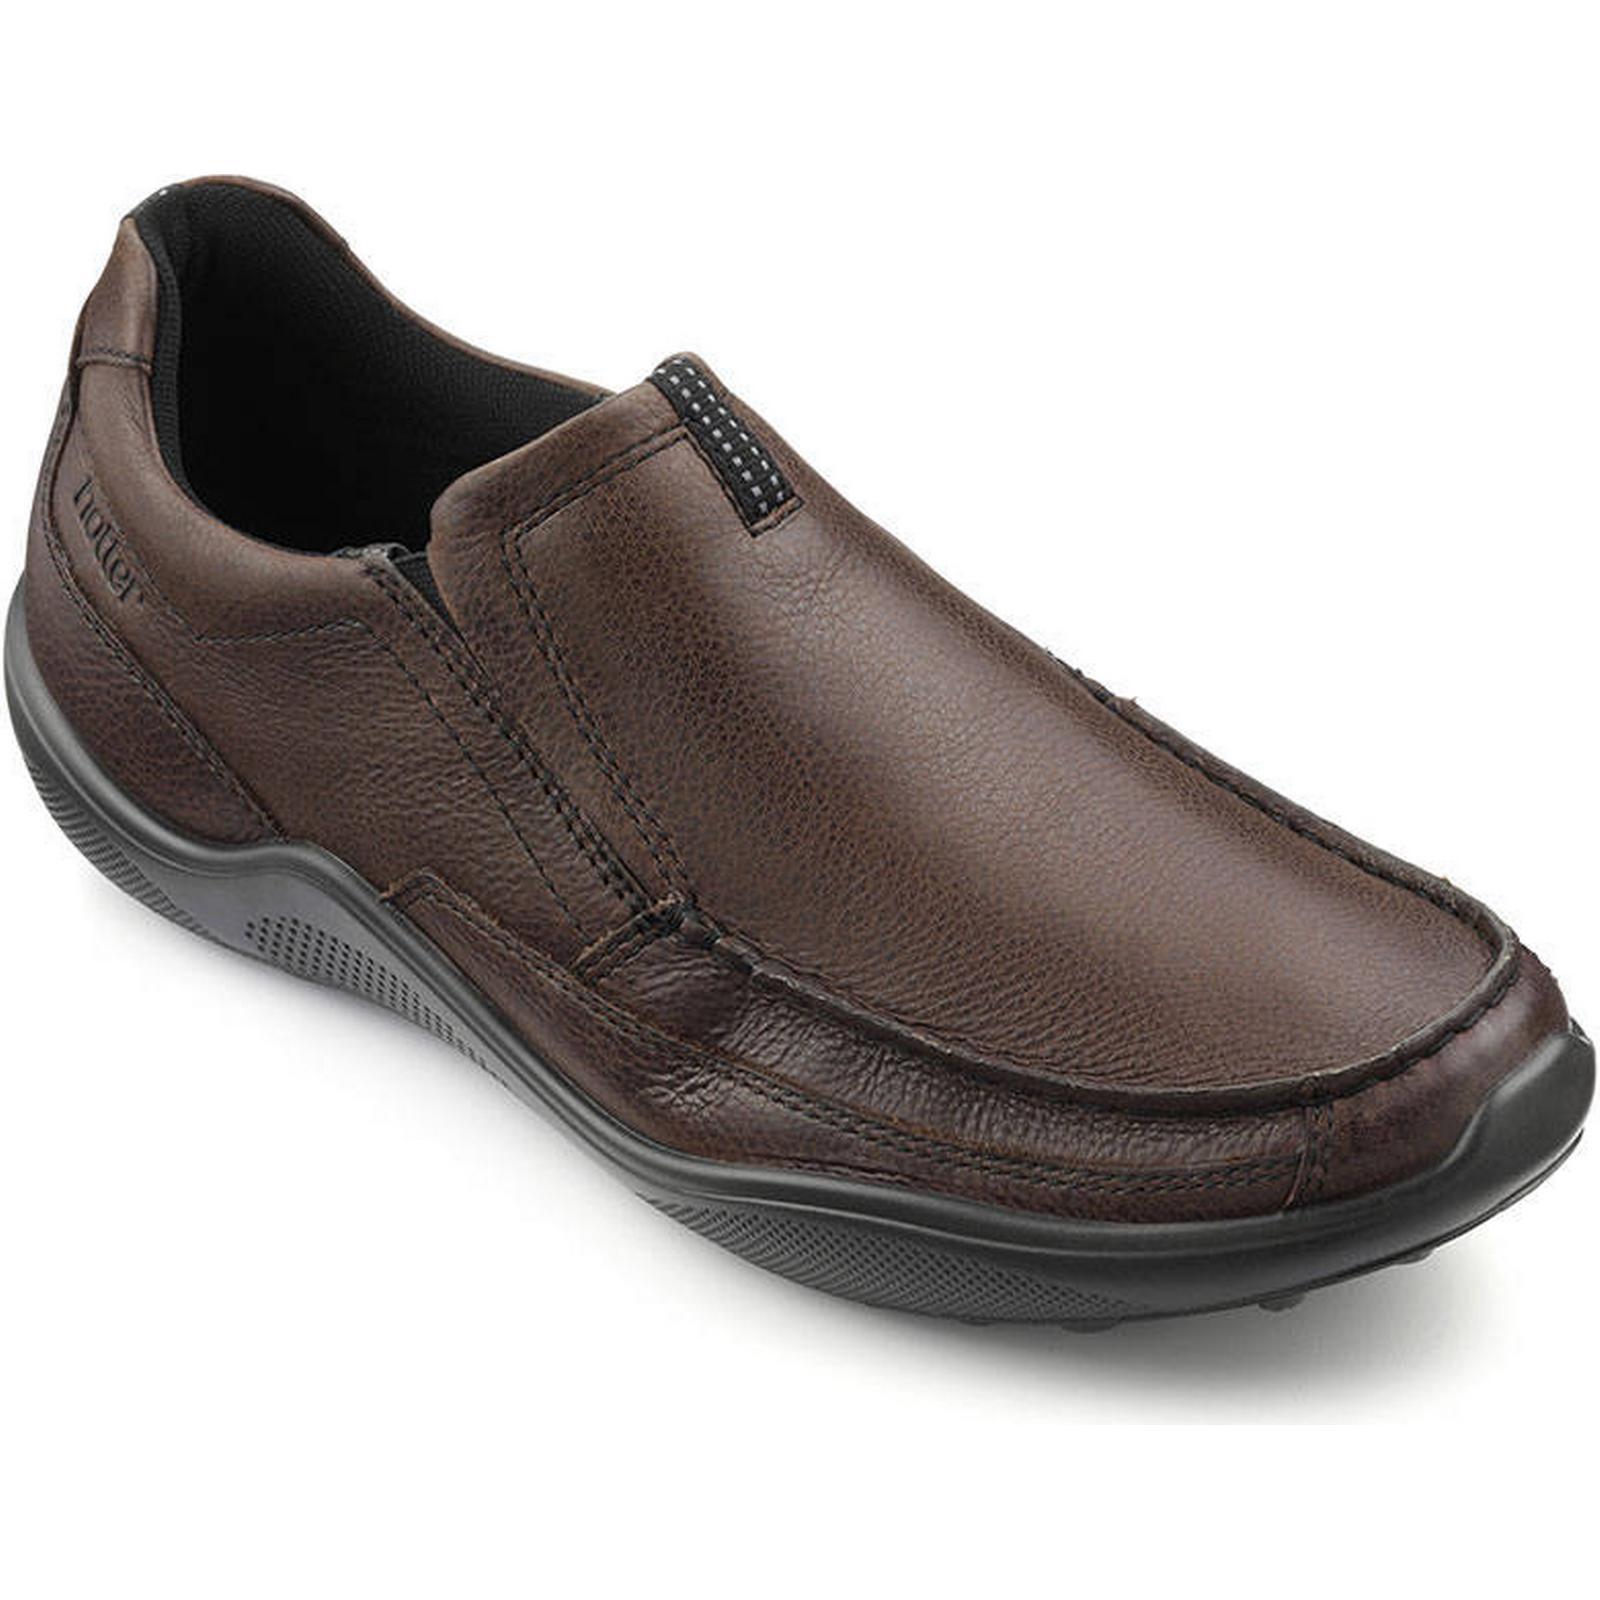 Boost - Shoes - Brown - Boost Standard Fit - 11 f1864b